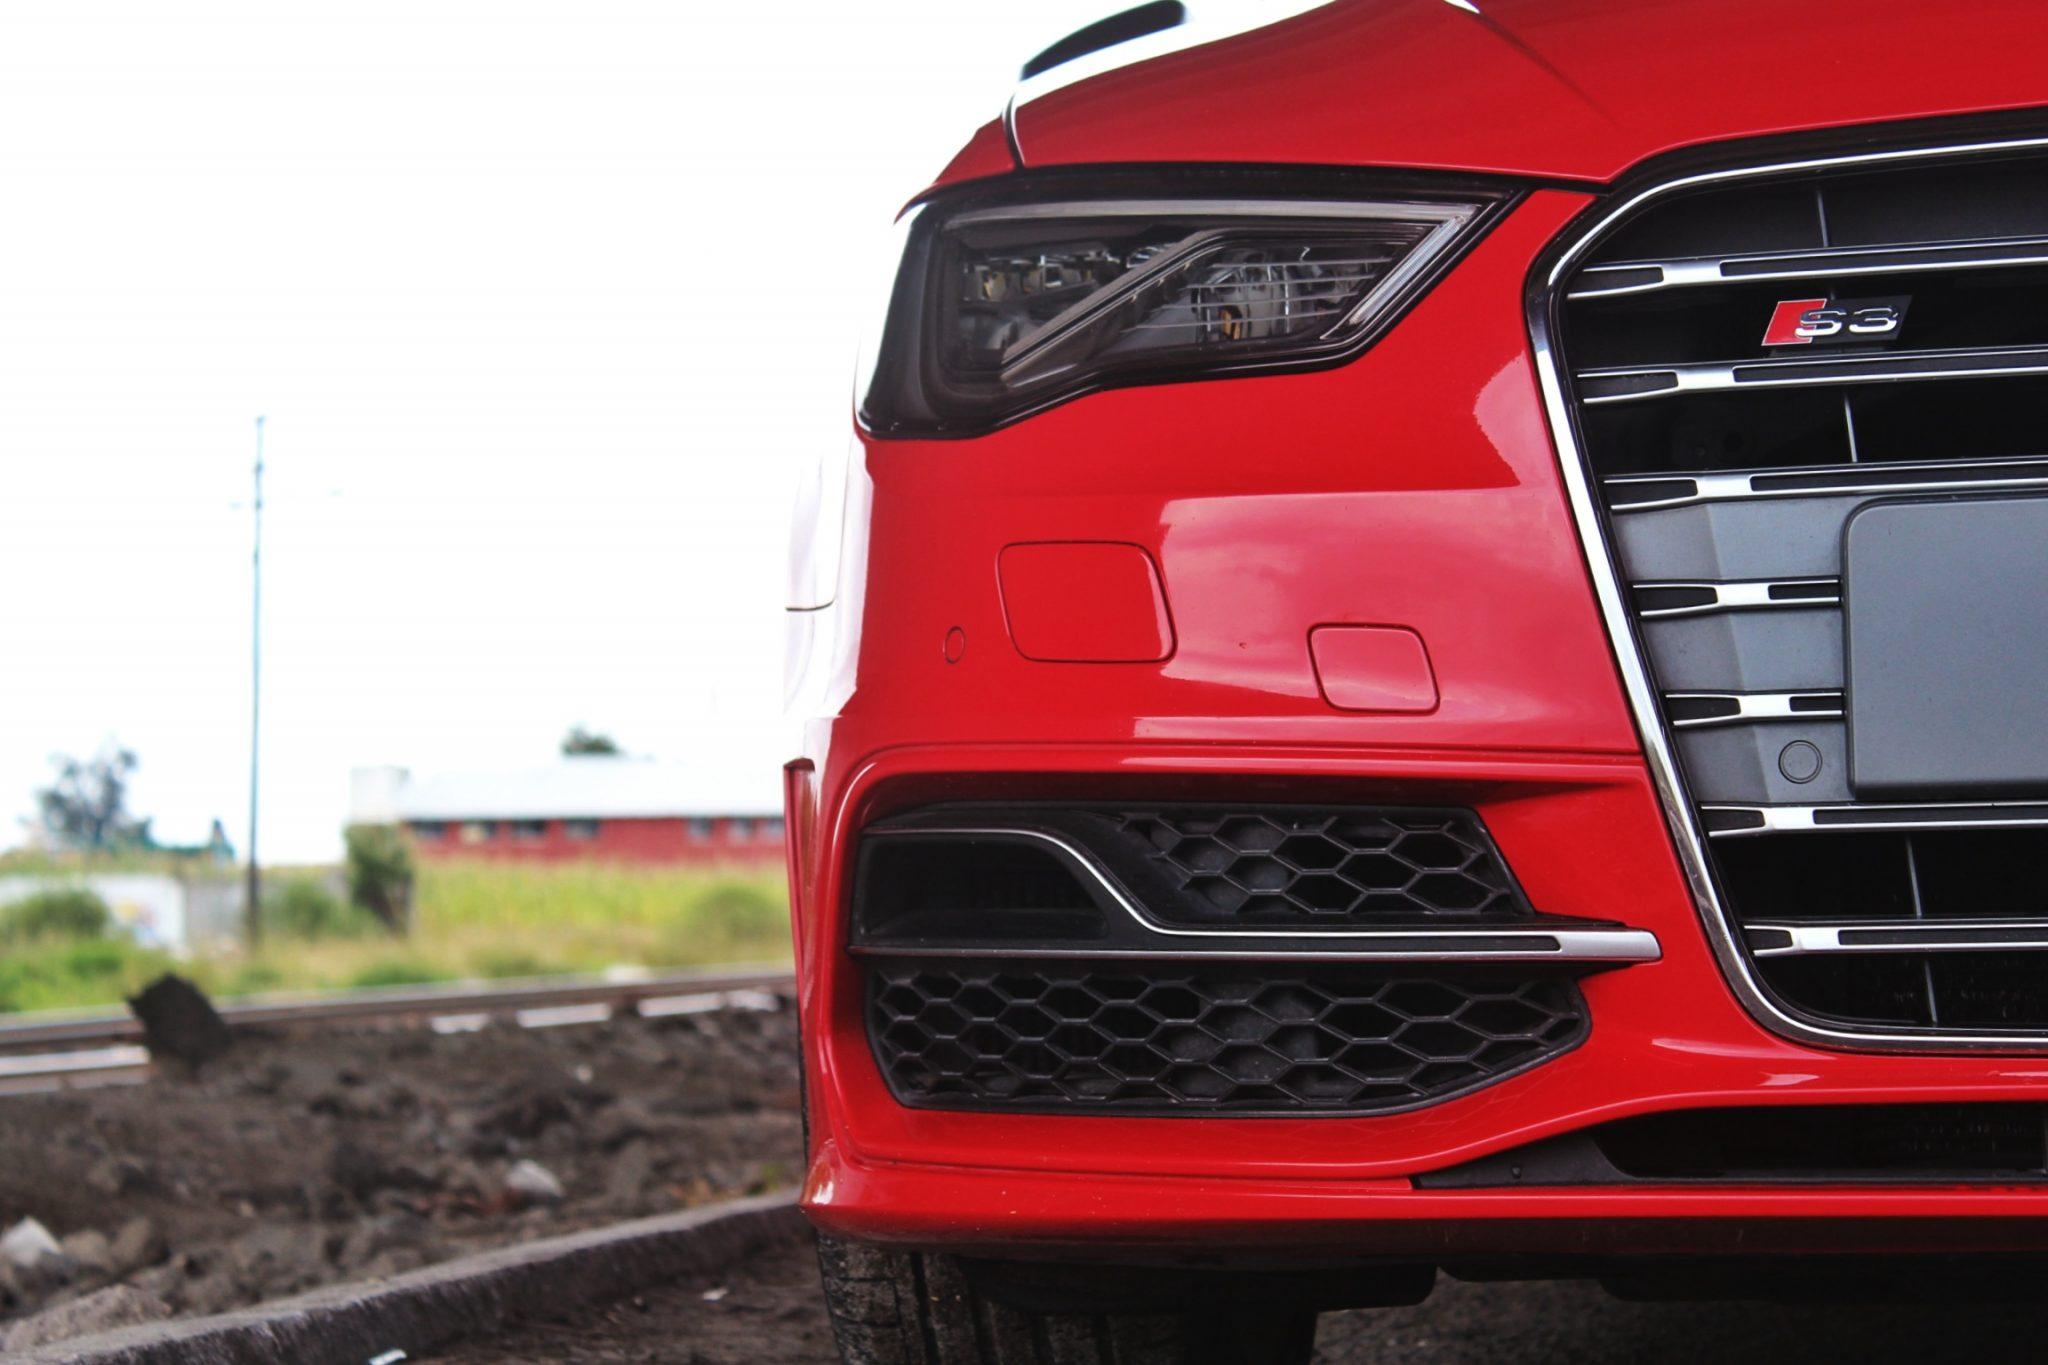 Experiencia de manejo: Audi S3 Hatchback